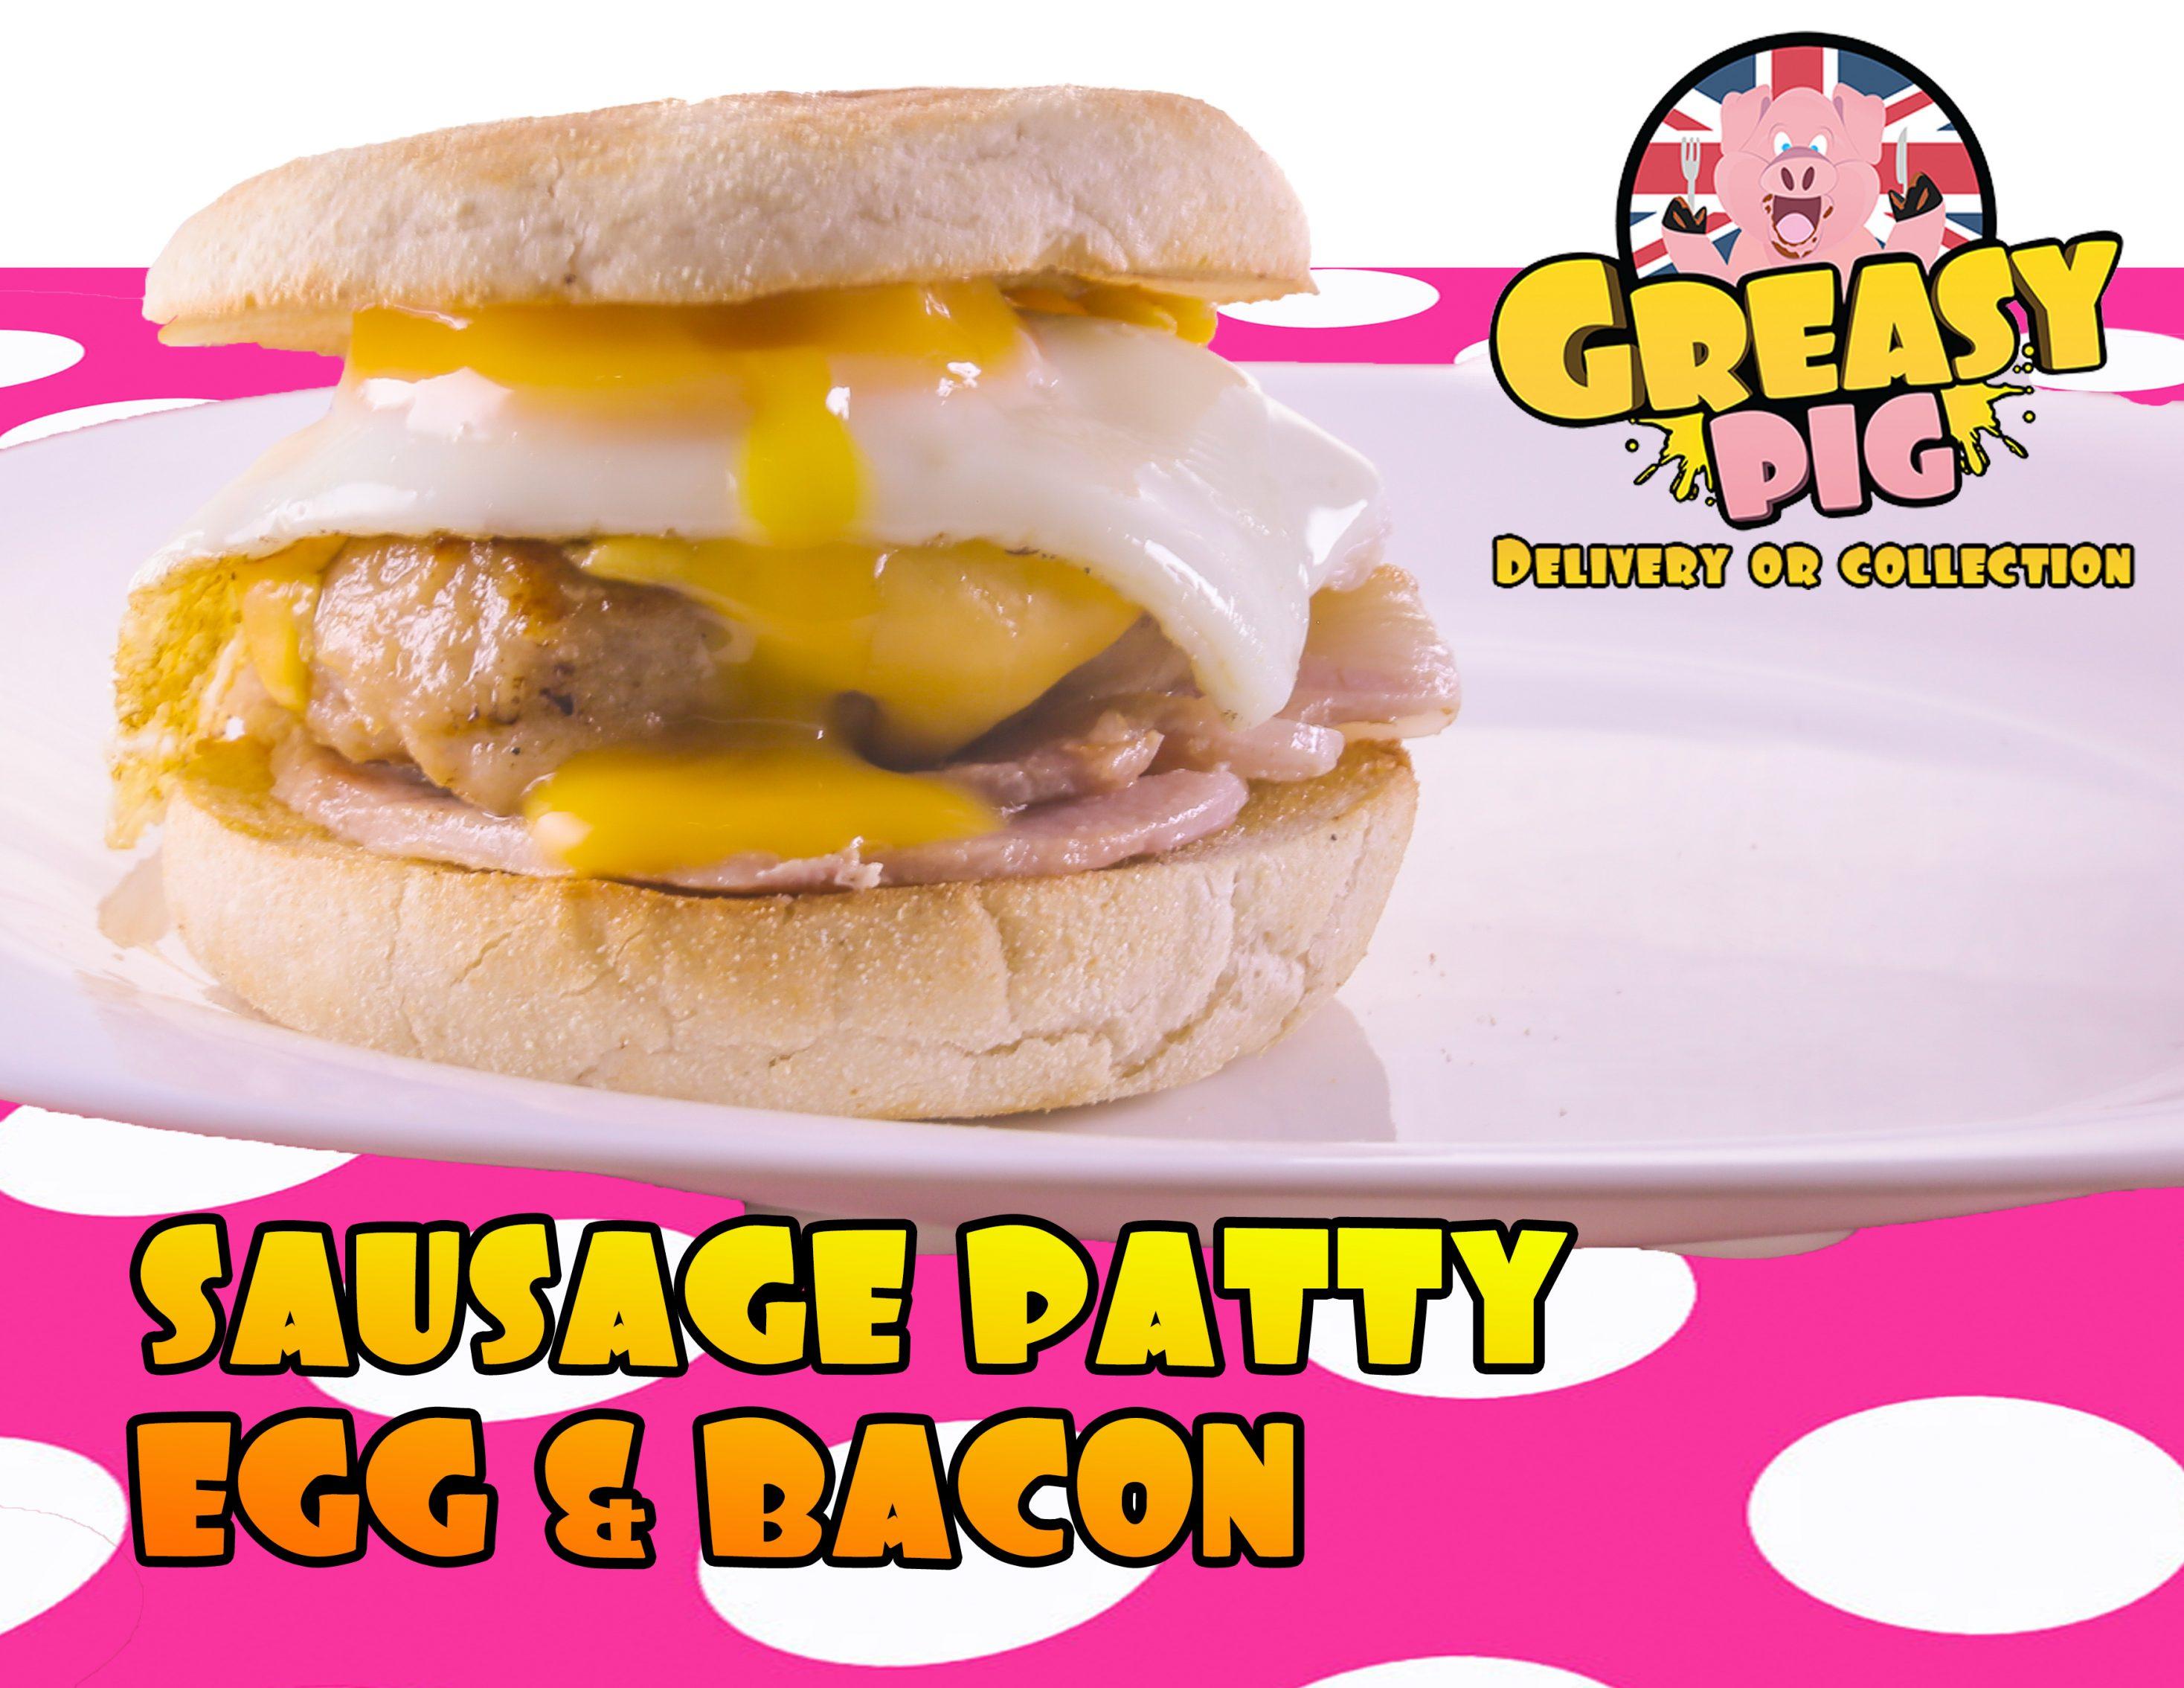 Sausage patty egg and bacon